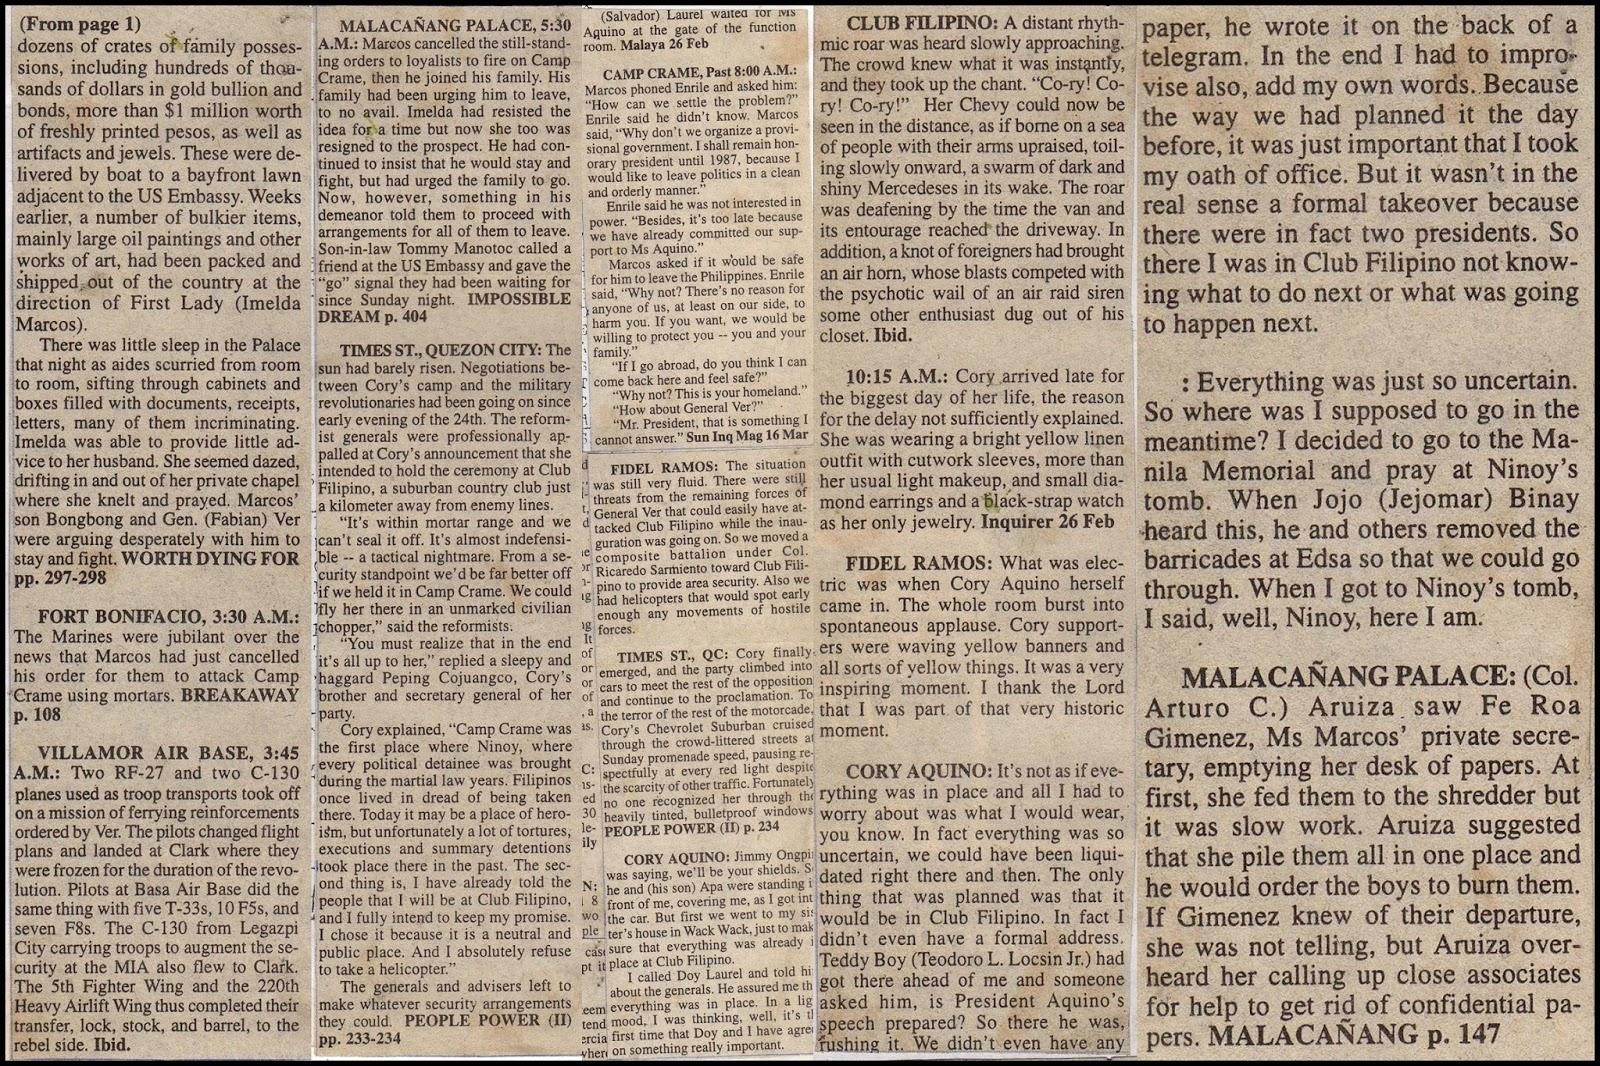 People Power Revolution, EDSA, Chronology of a Revolution, 1986